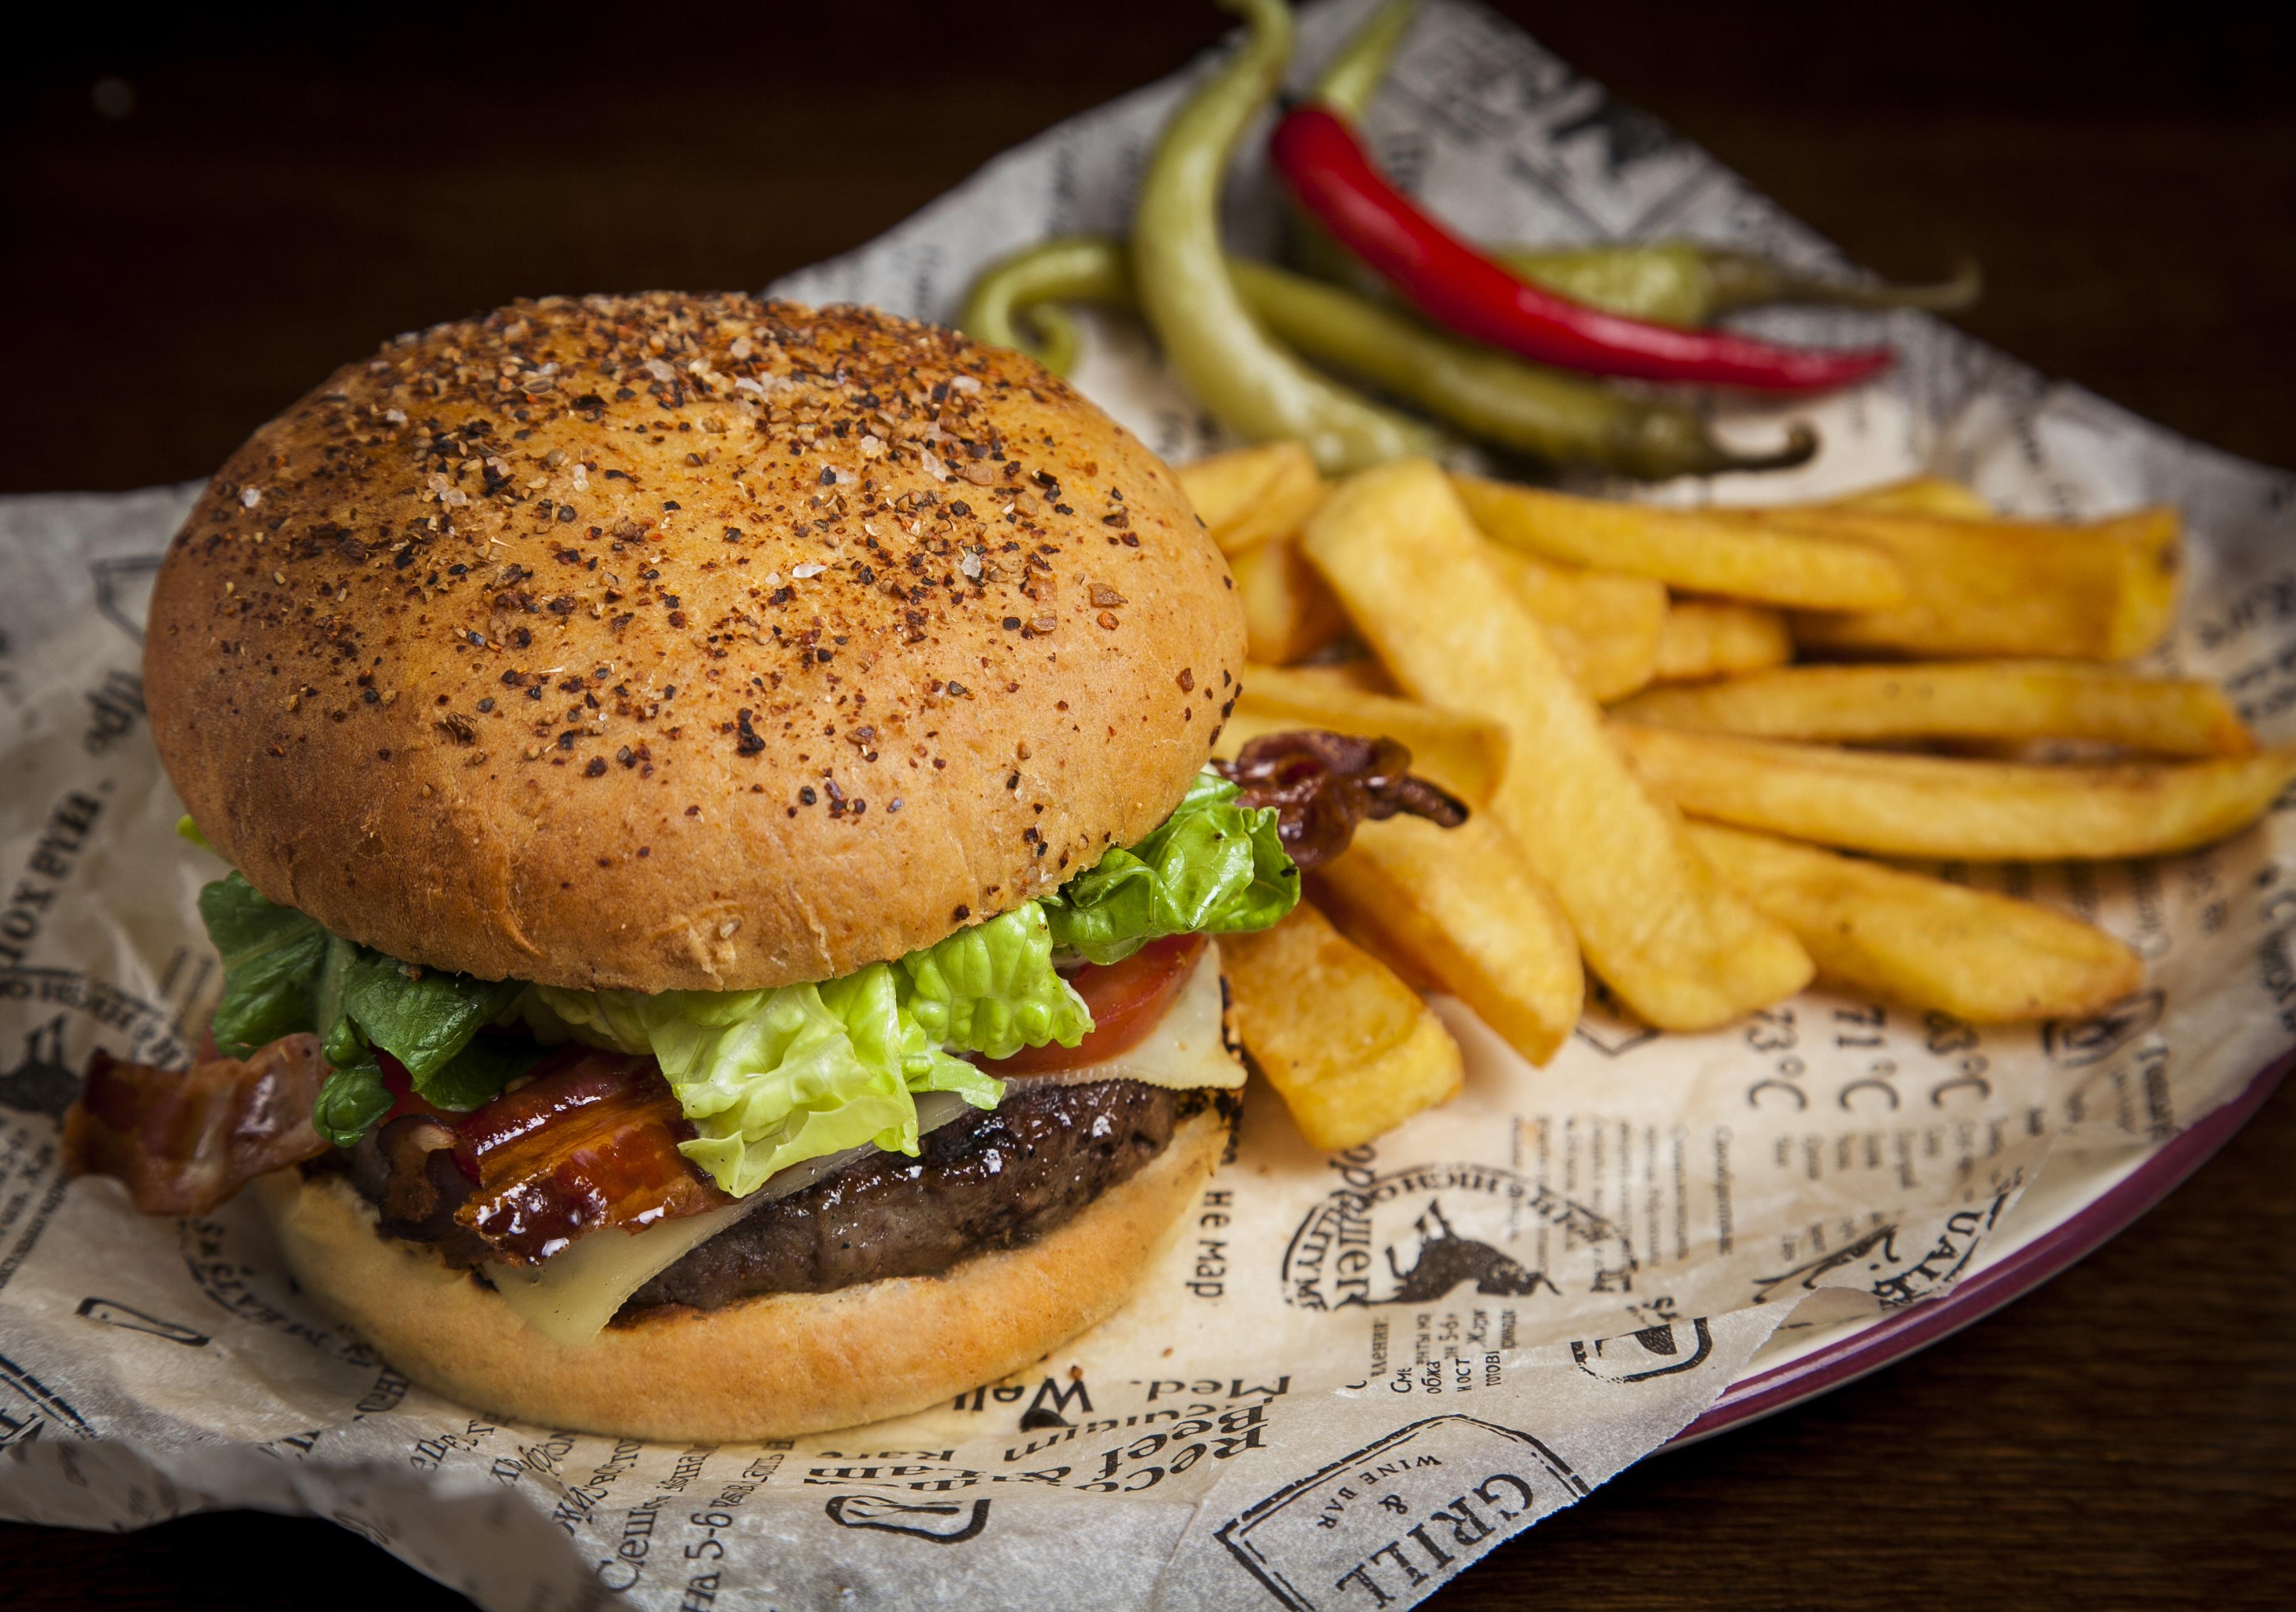 Ресторан Torro Grill - BLT бургер